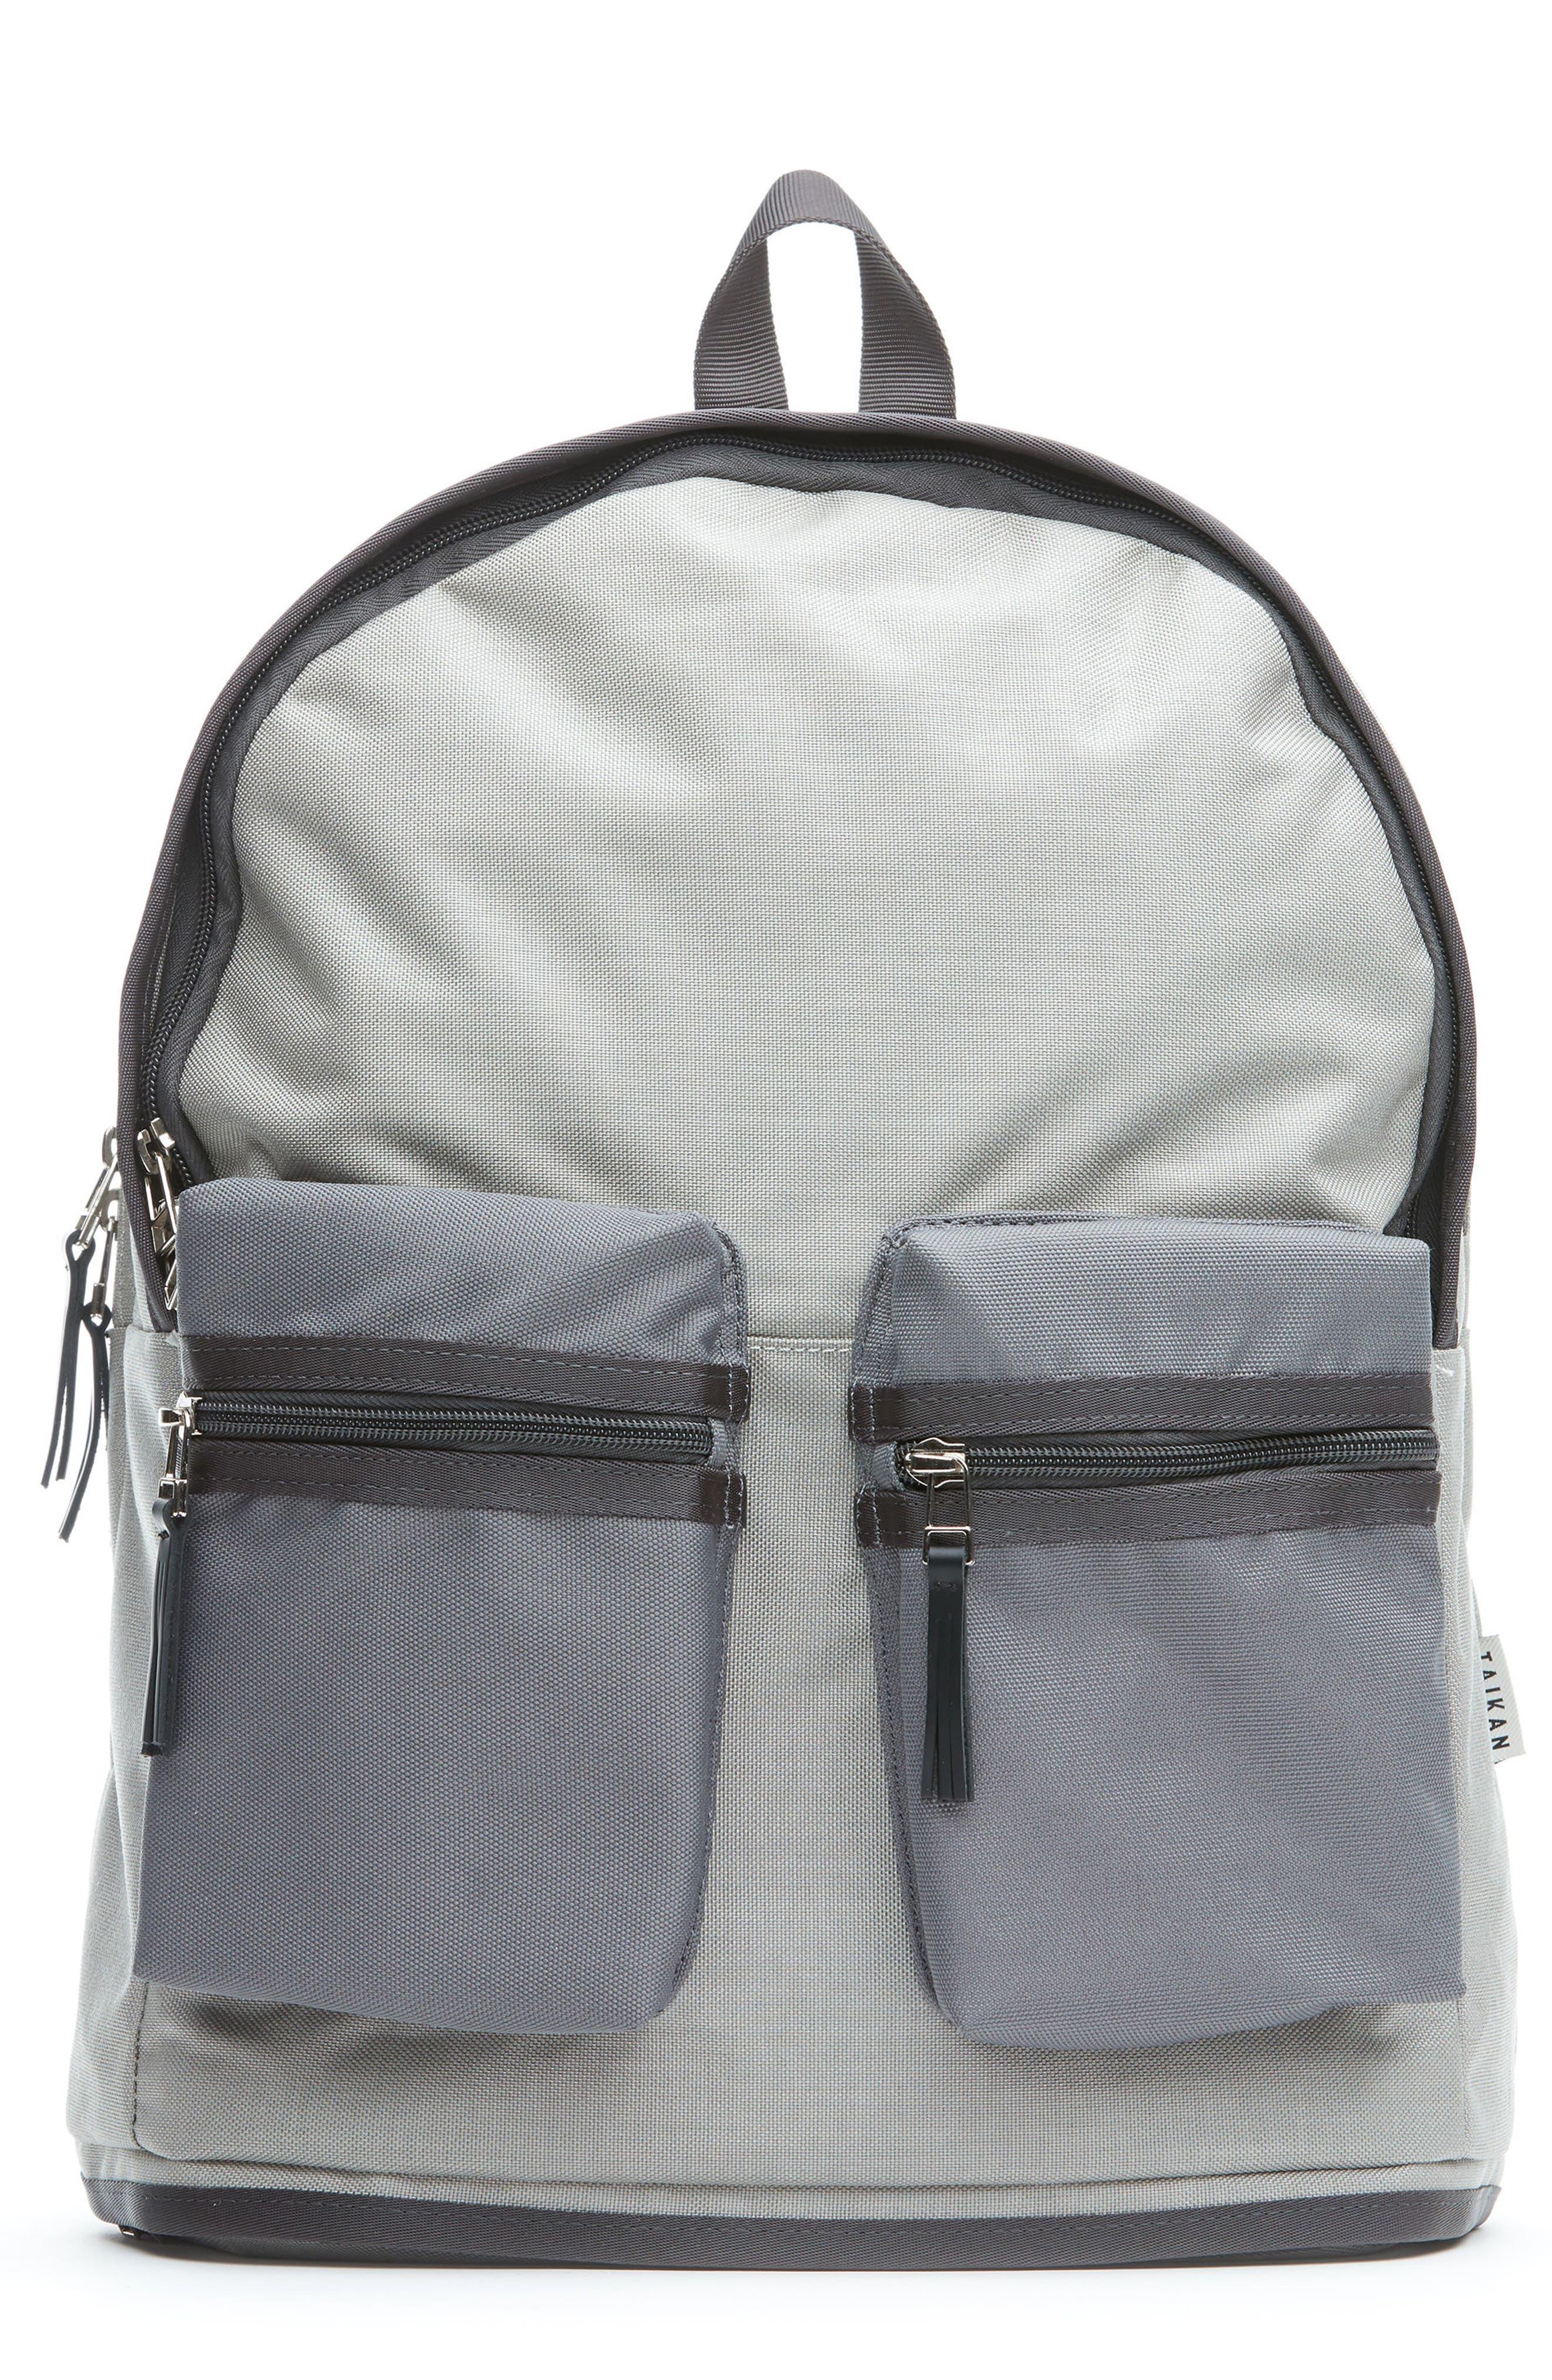 Spartan Backpack,                         Main,                         color, Grey/ Grey